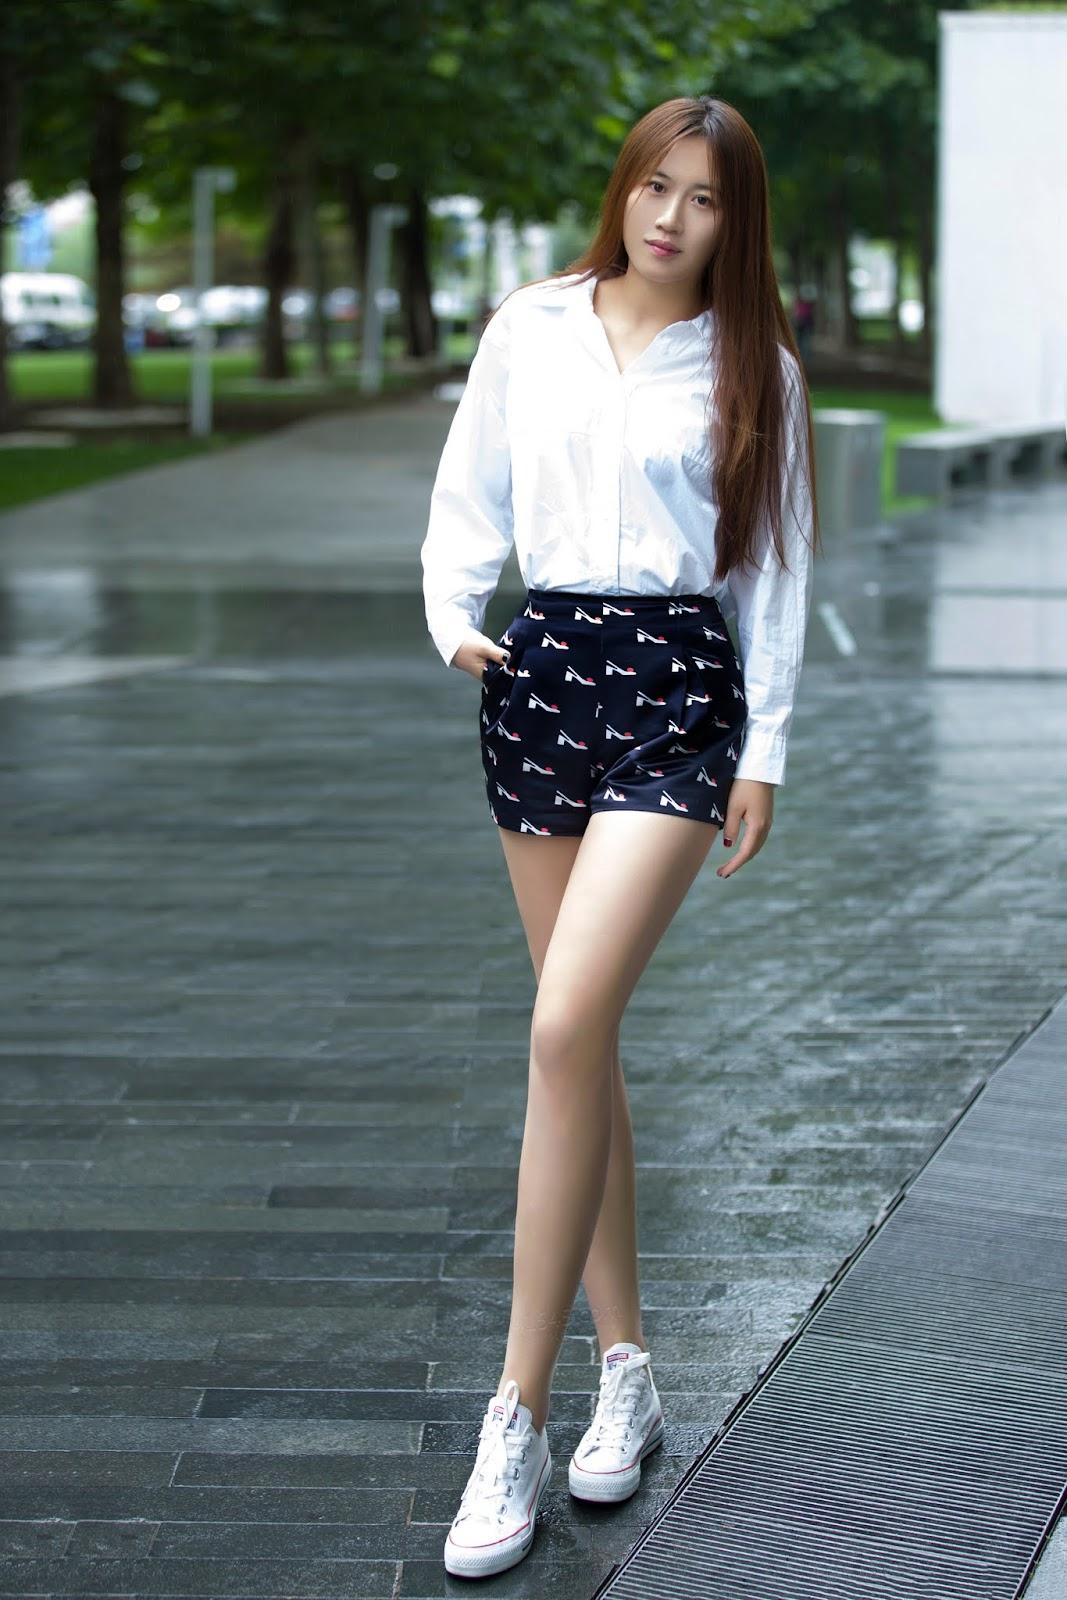 Jessica%2B%25288%2529 - TuiGirl No.60